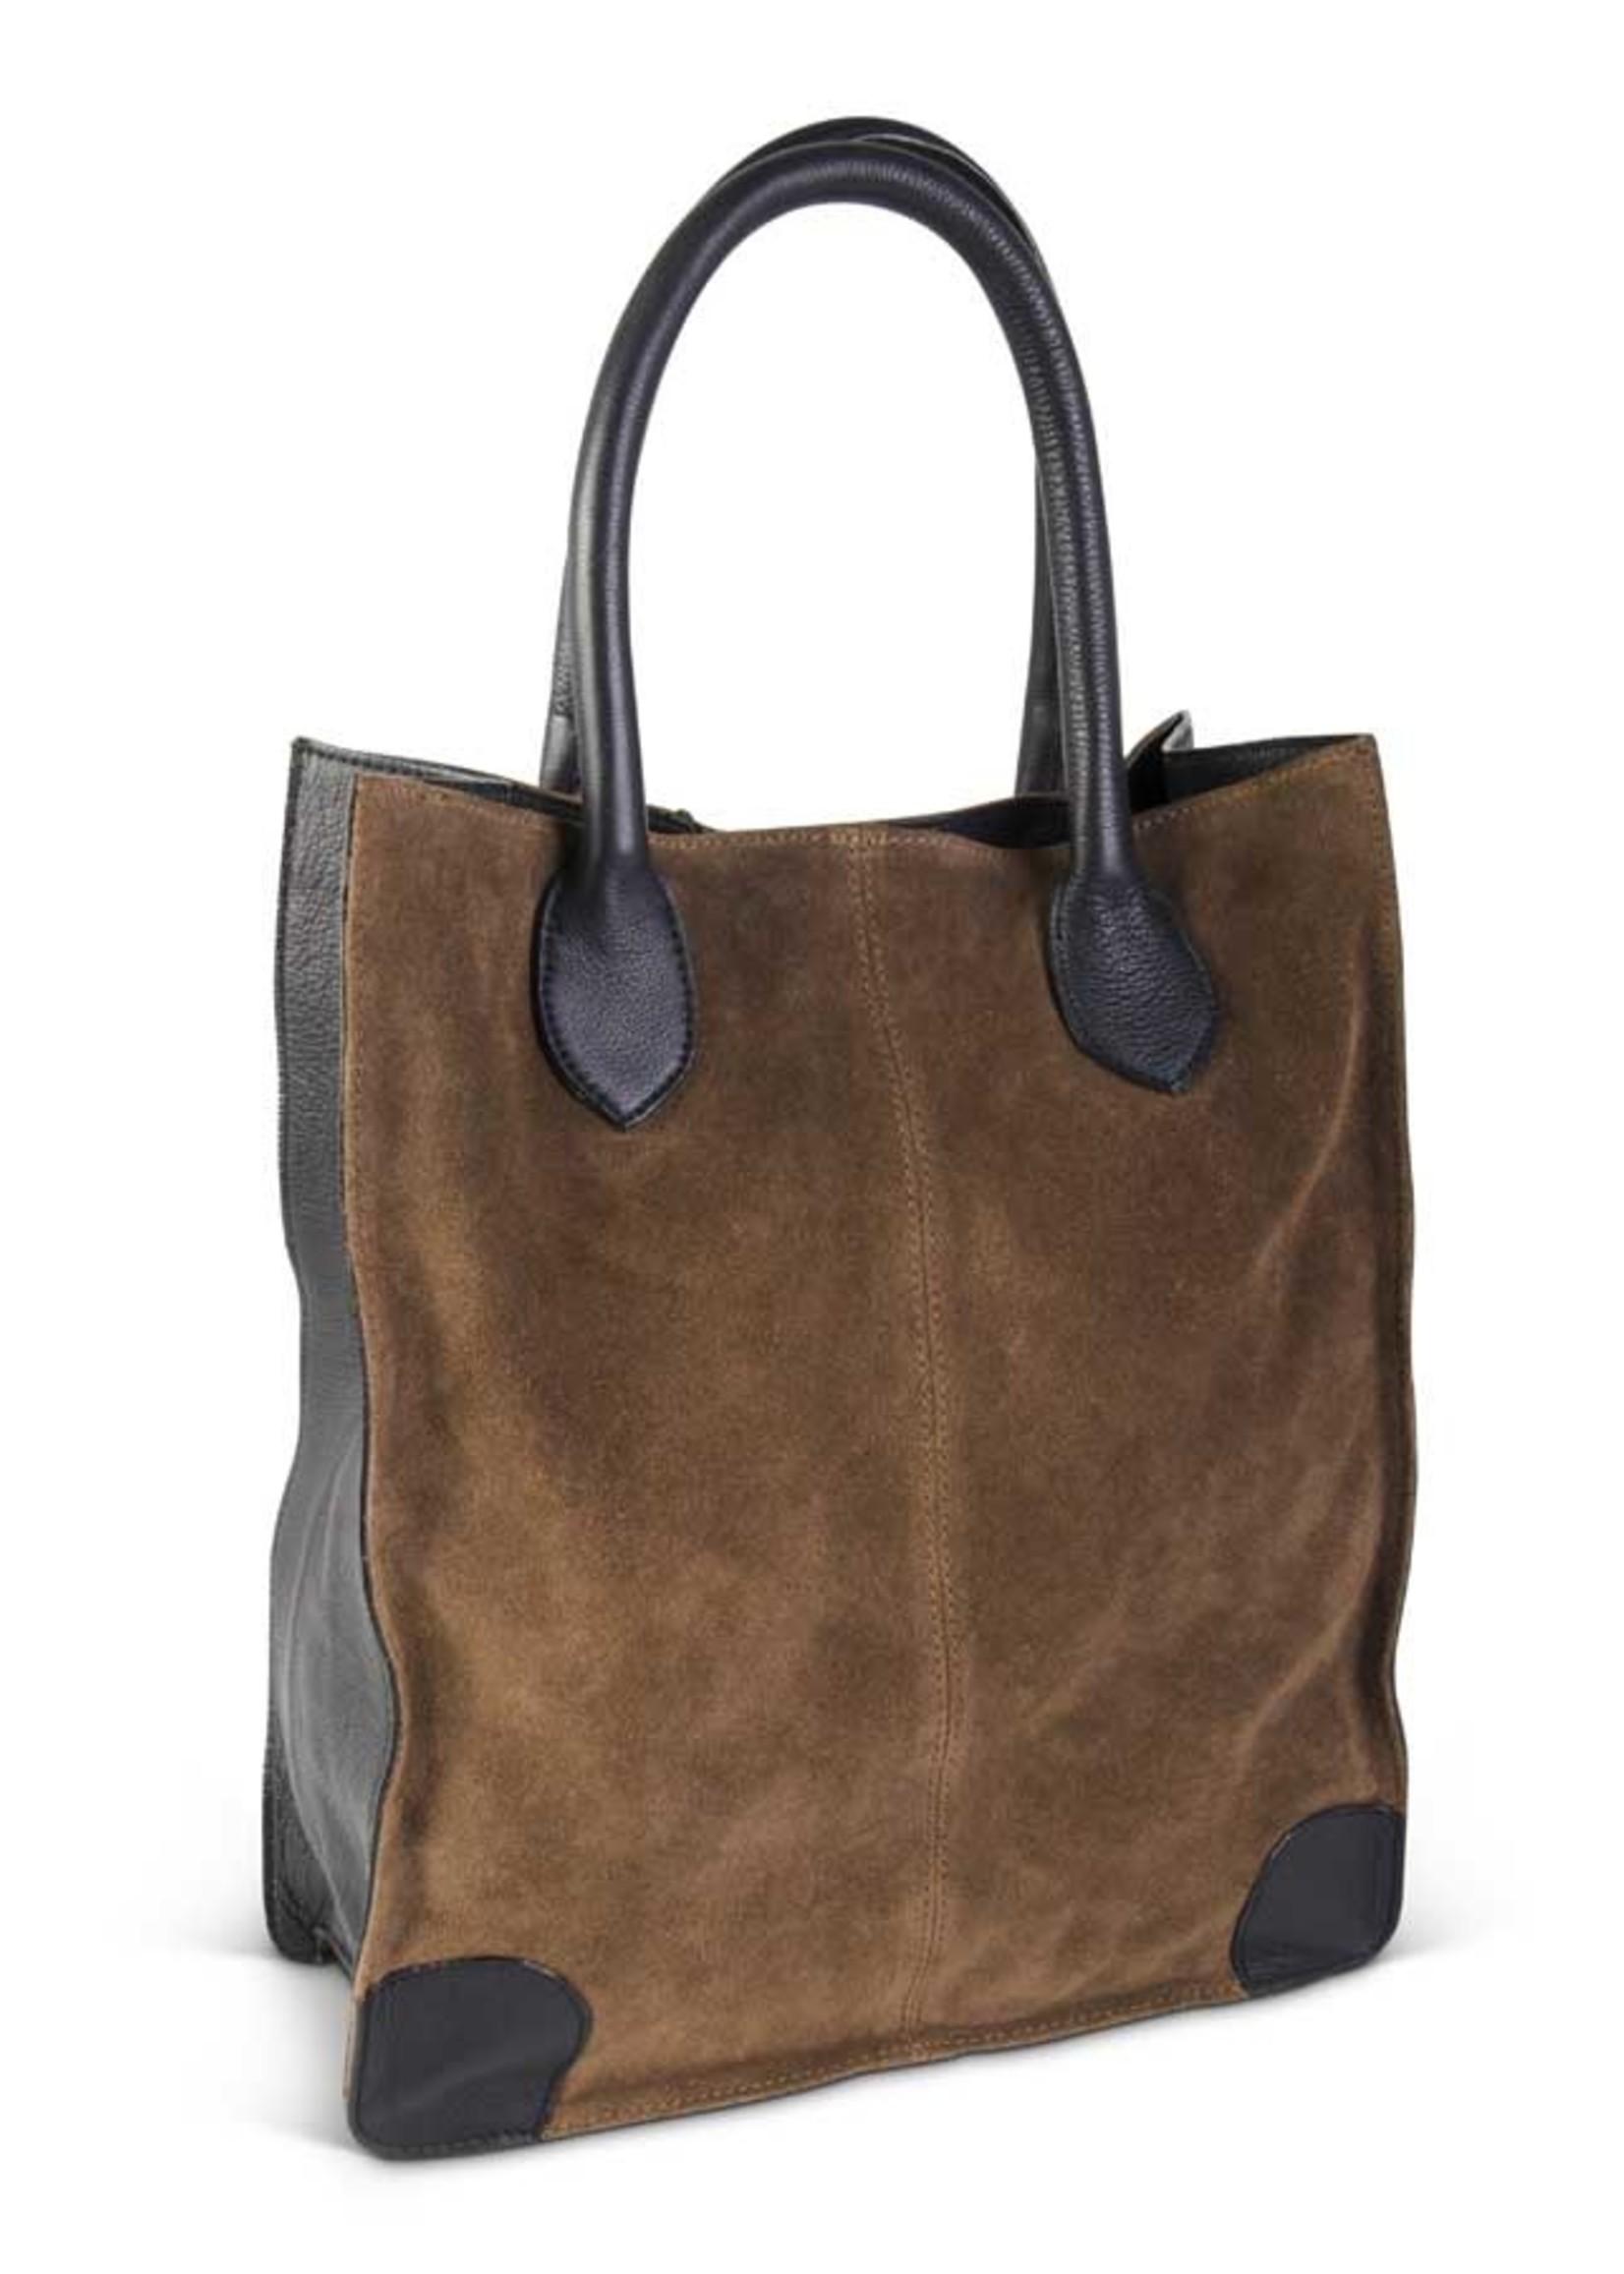 K & K Interiors Brown and Black Suede Bag